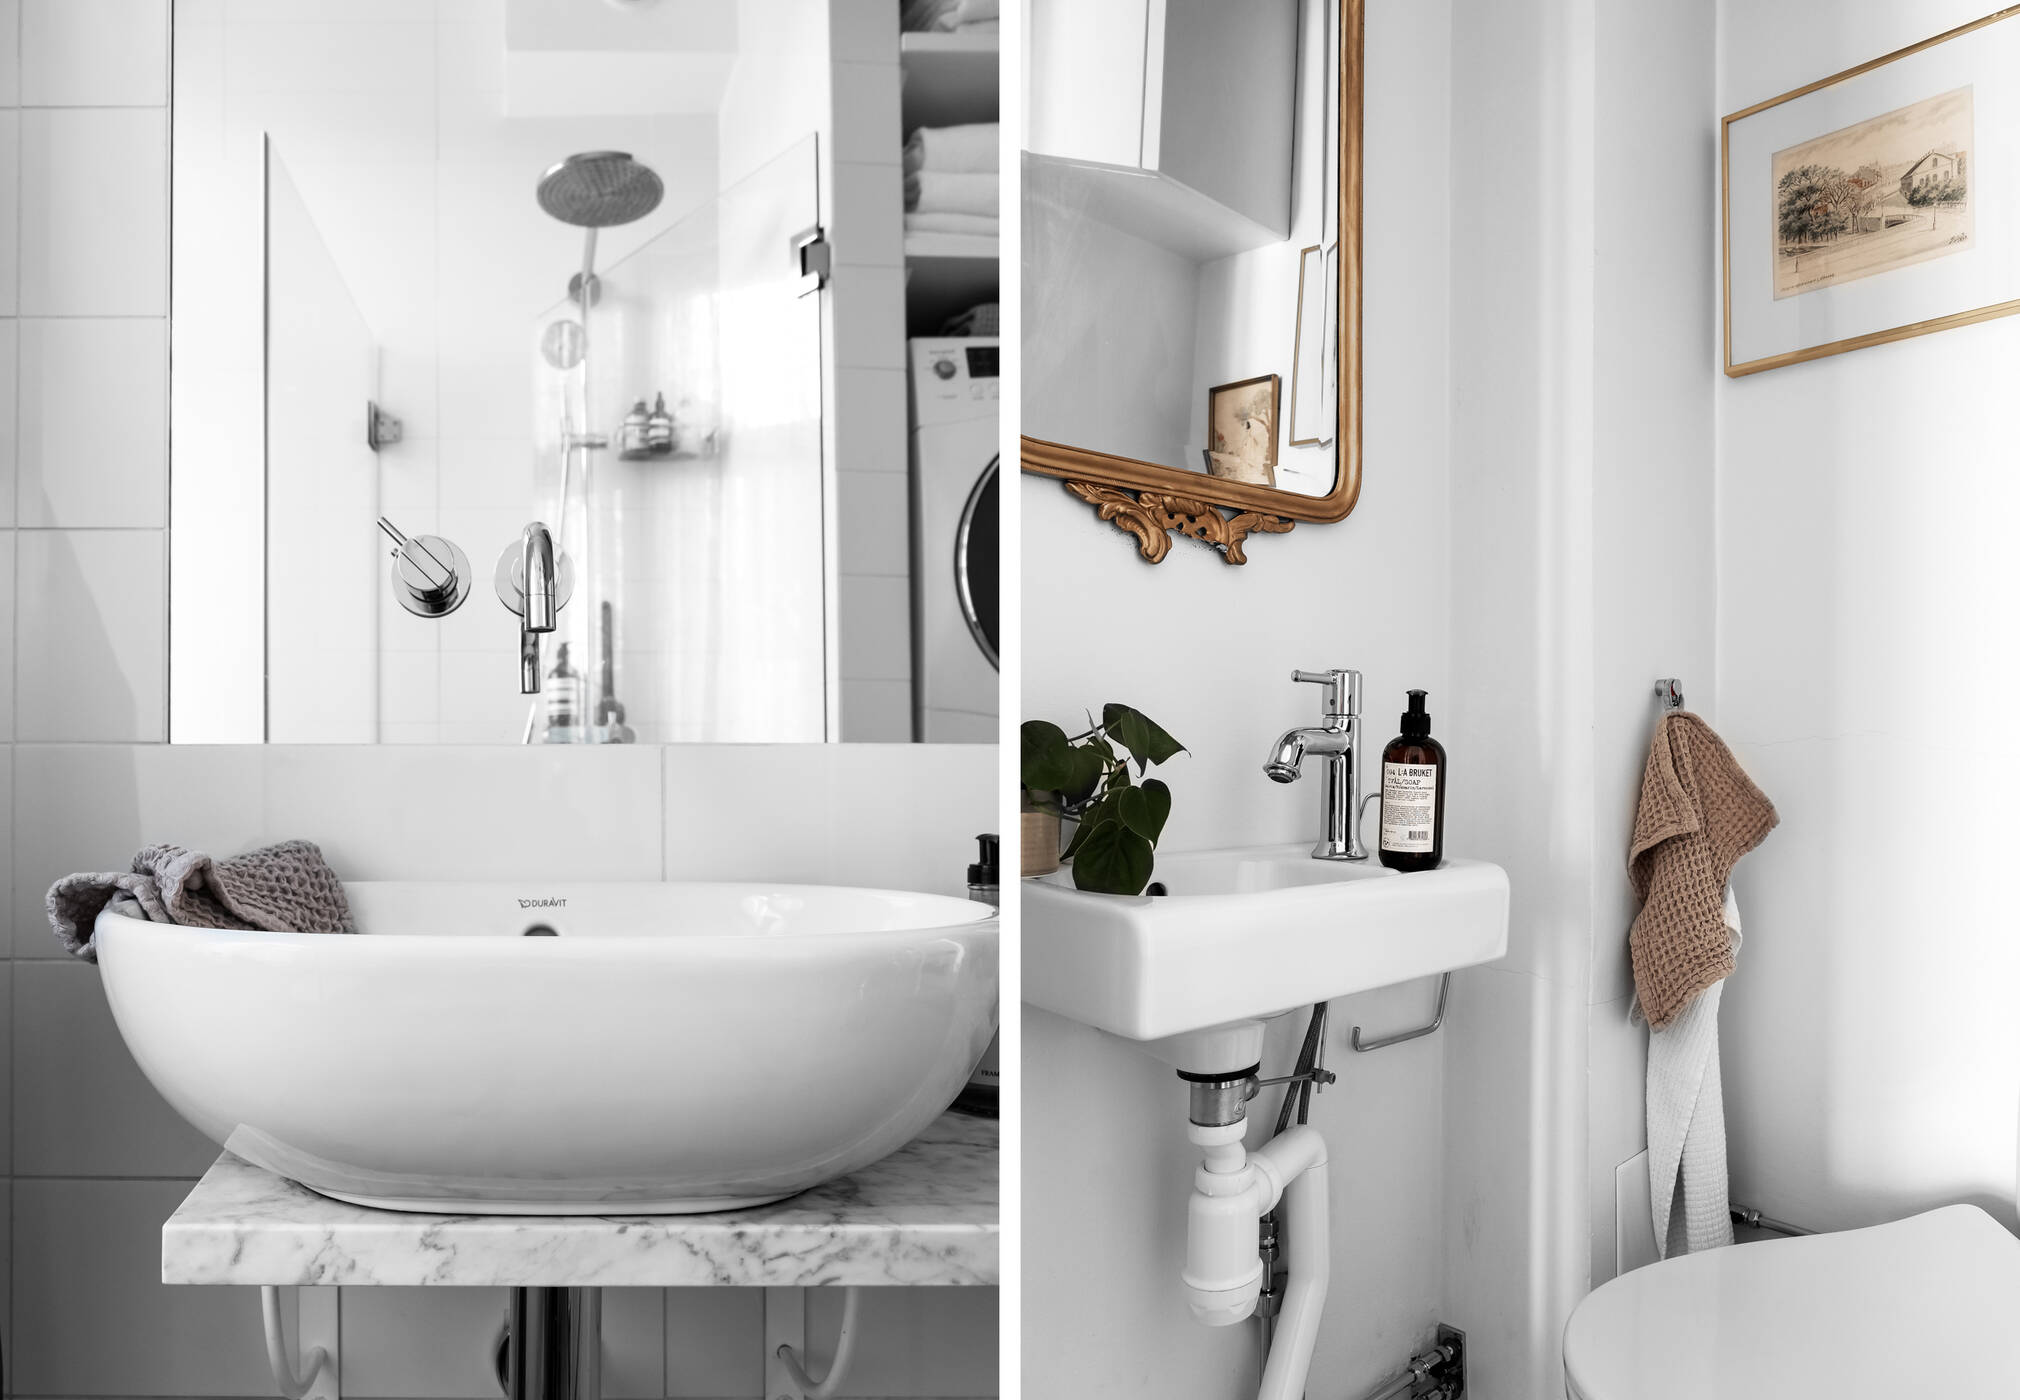 Detalj badrum / gäst-wc